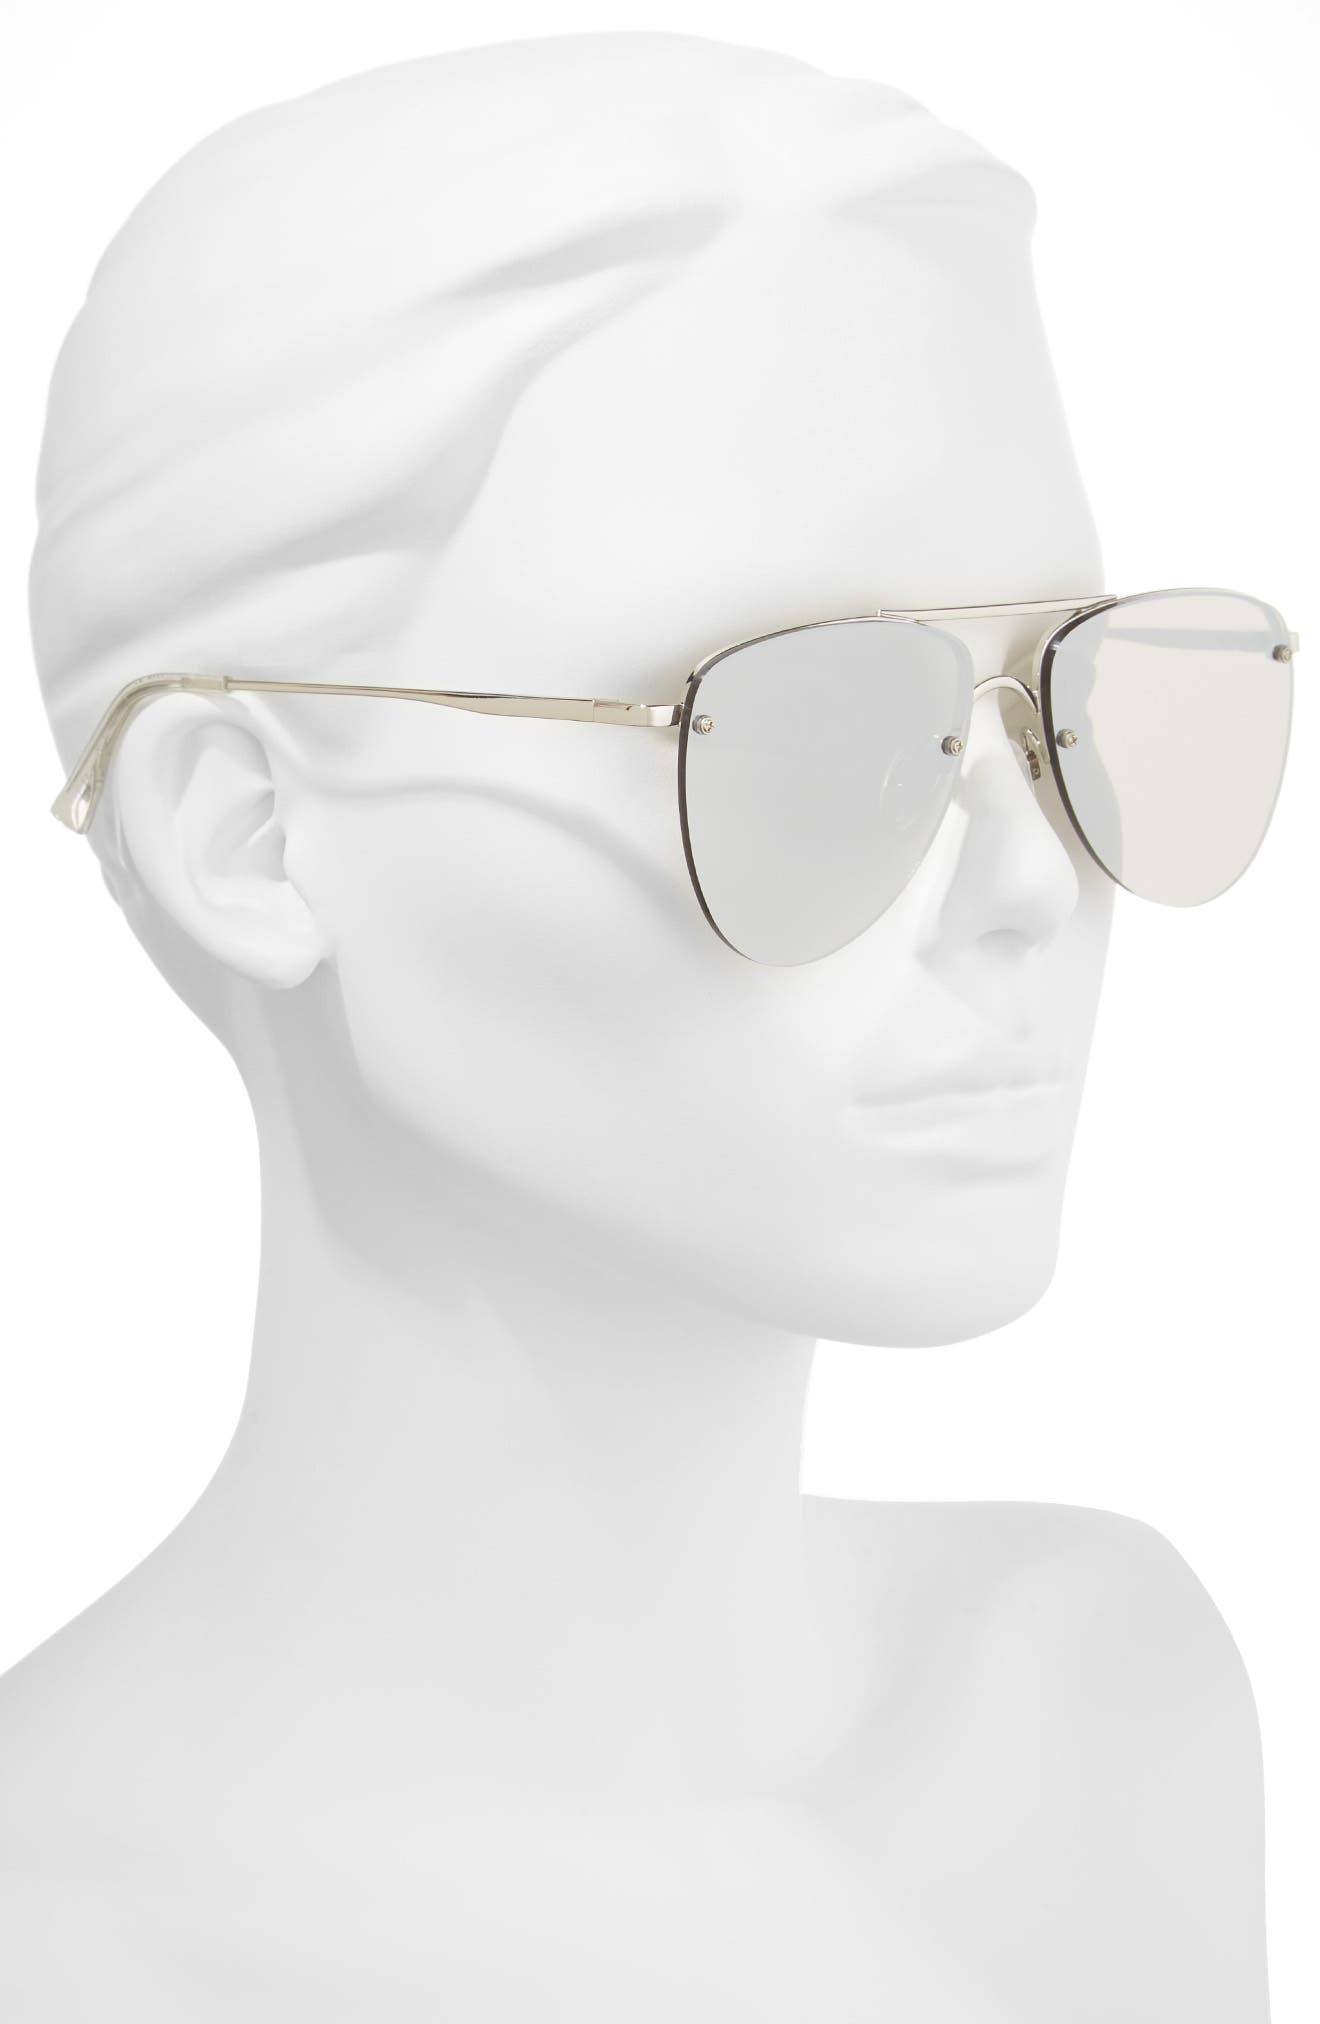 The Prince 57mm Aviator Sunglasses,                             Alternate thumbnail 2, color,                             040